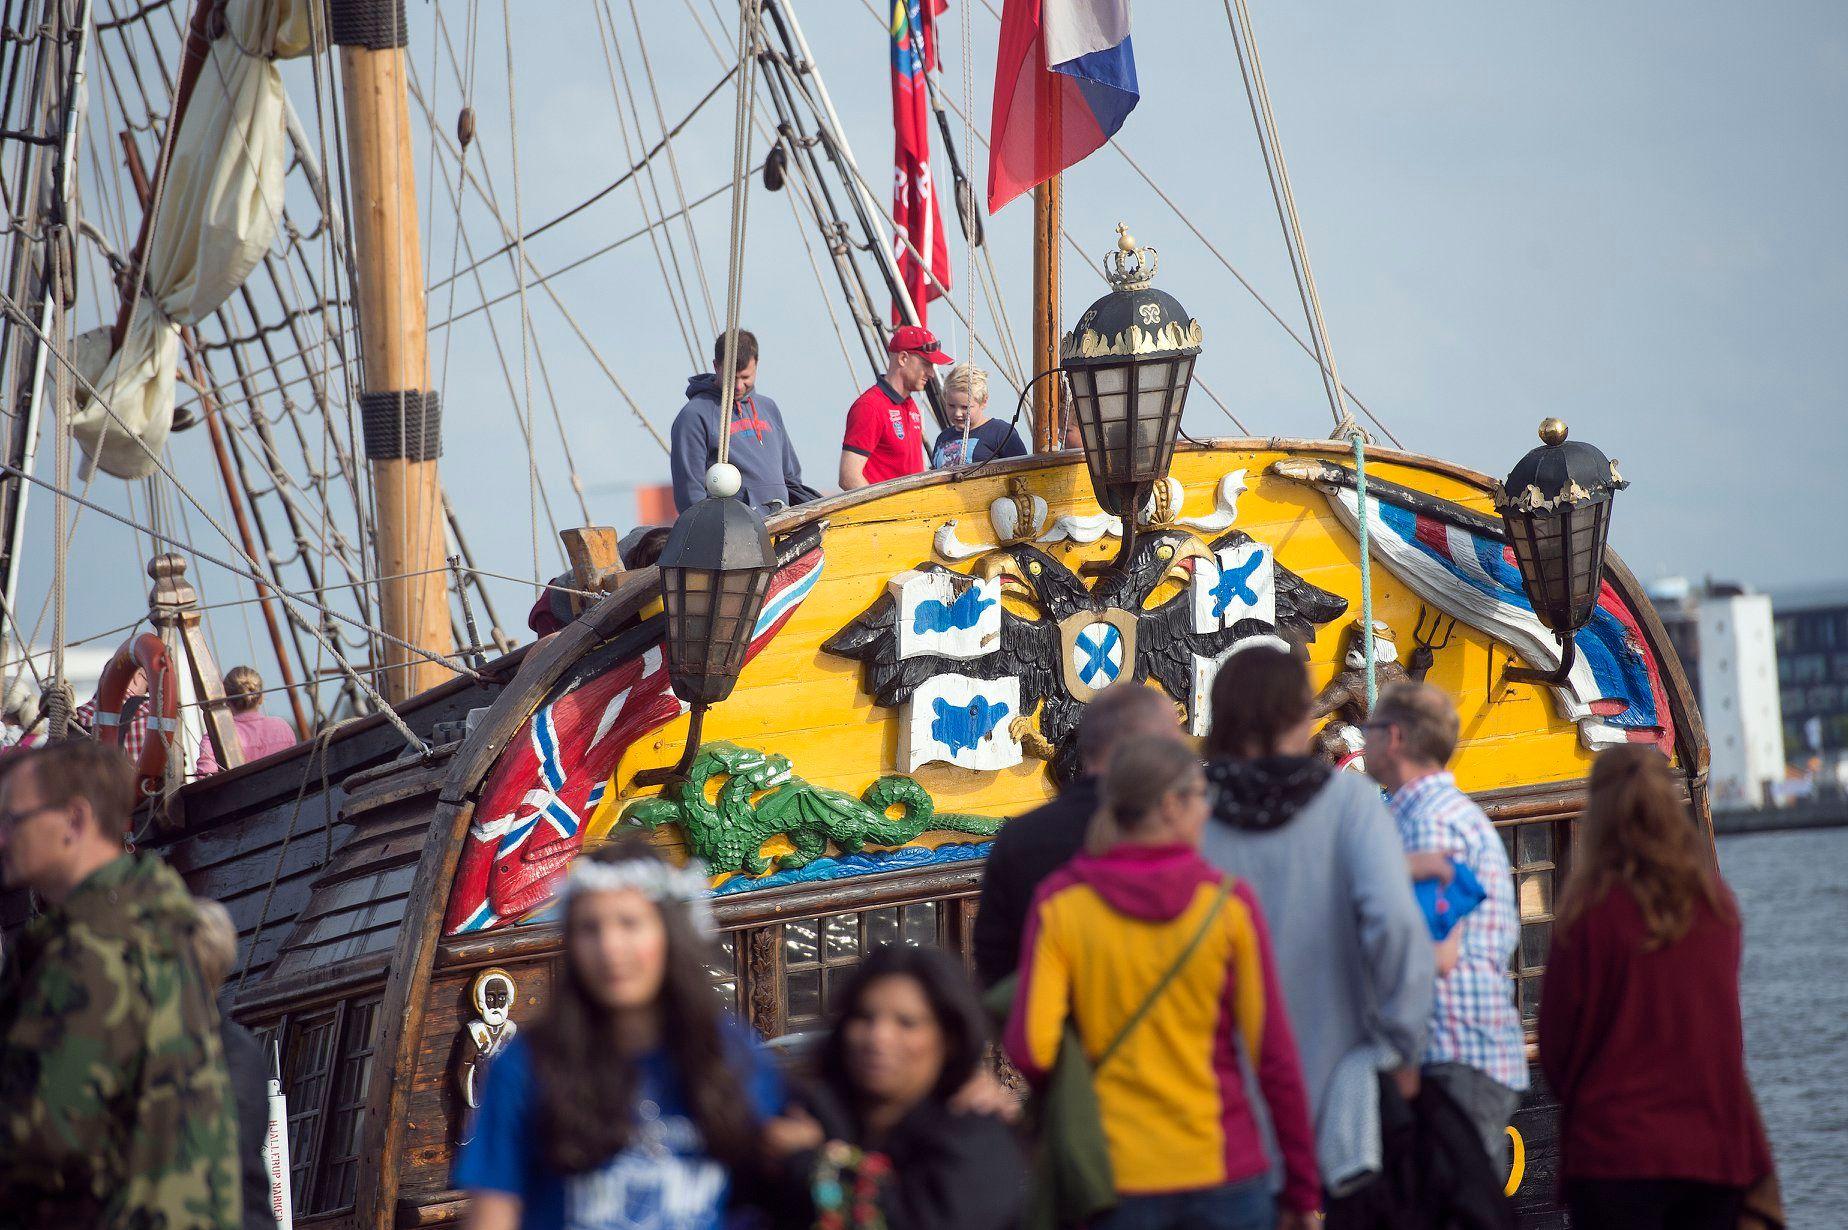 Tall Ships Race i børnehøjde: Kæmpe legeland på Stigsborg Brygge